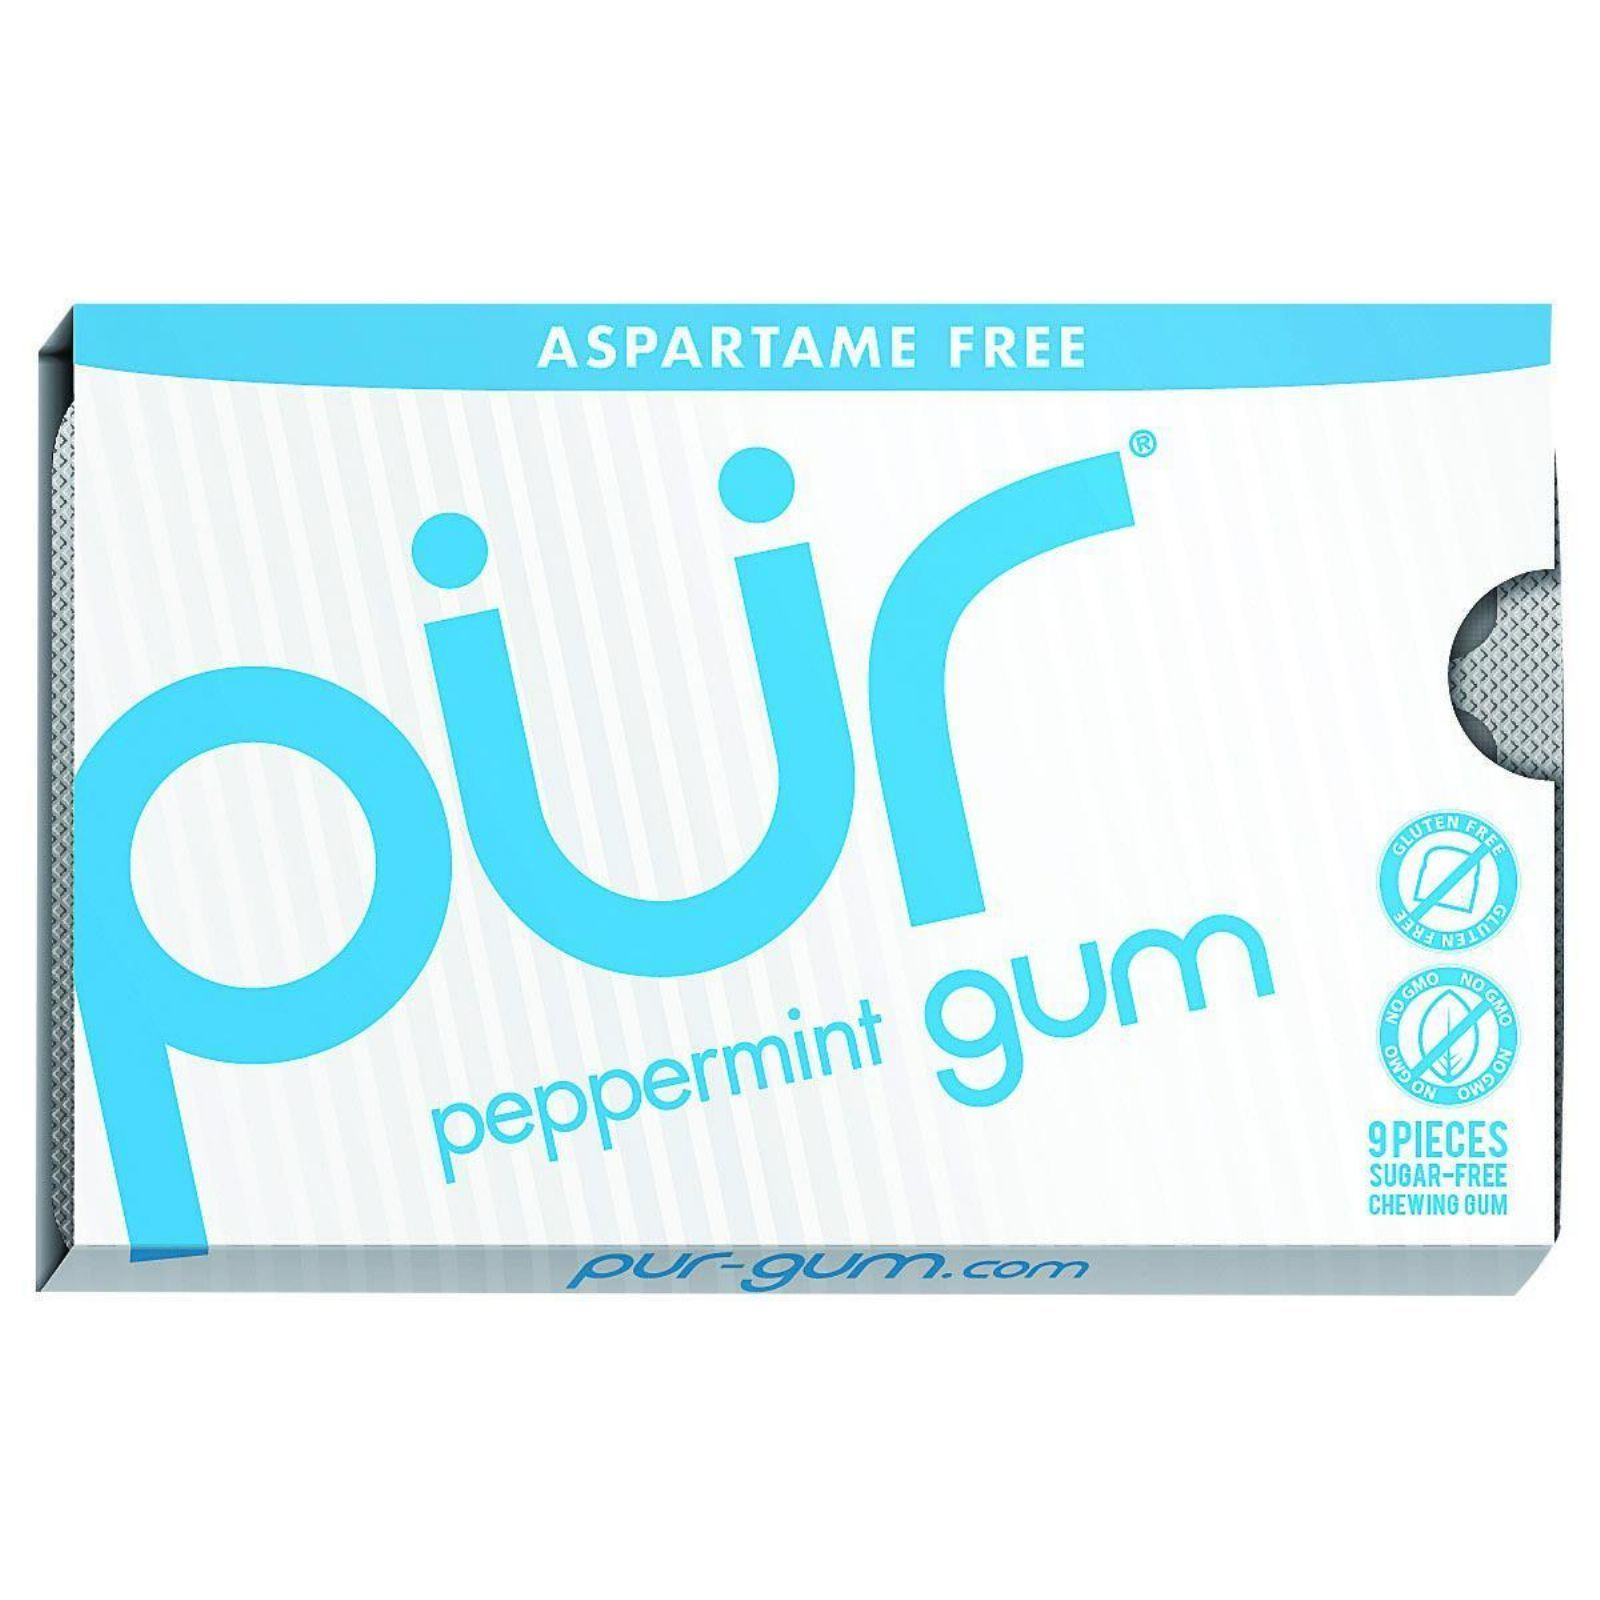 Pur Gum - Peppermint - Aspartame Free - 9 Pieces - 12.6 g - Case of 12